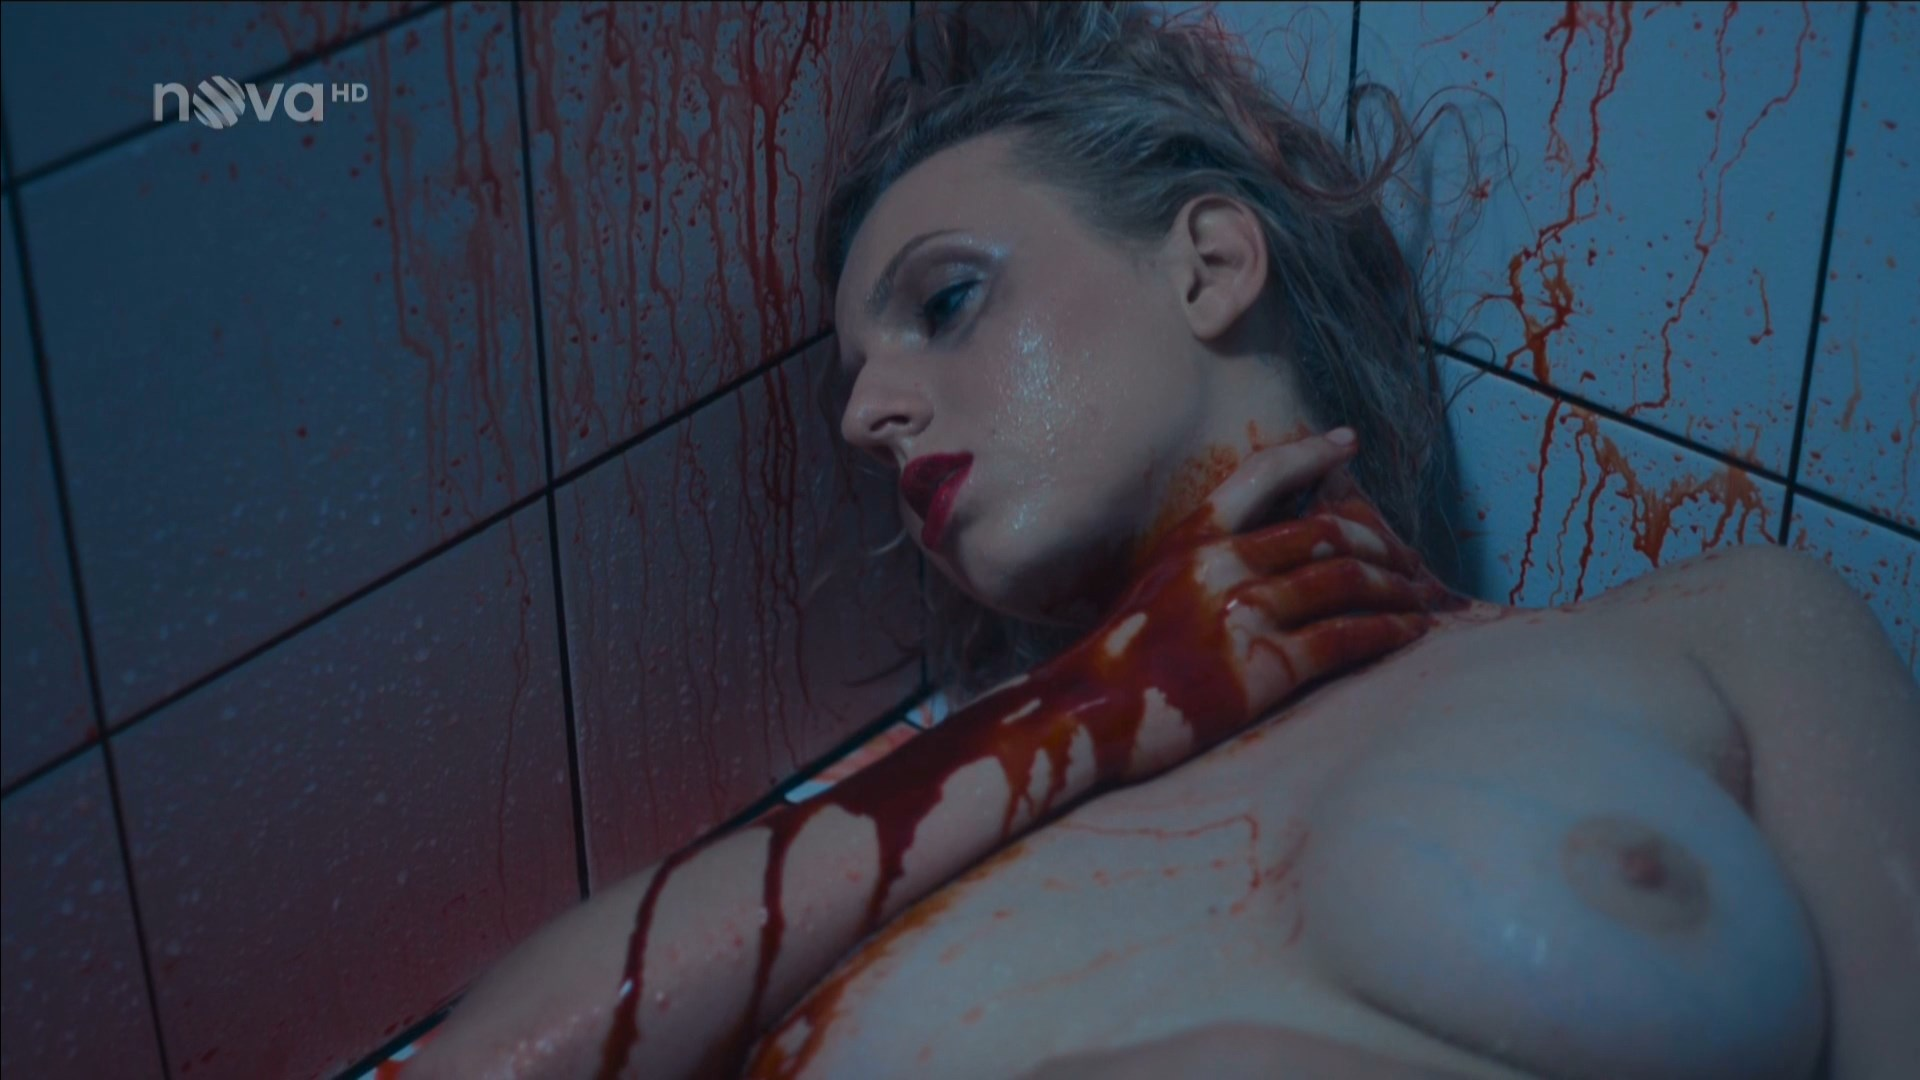 Rebeka Lizlerova nude - Dama a Kral s03e05 (2018)